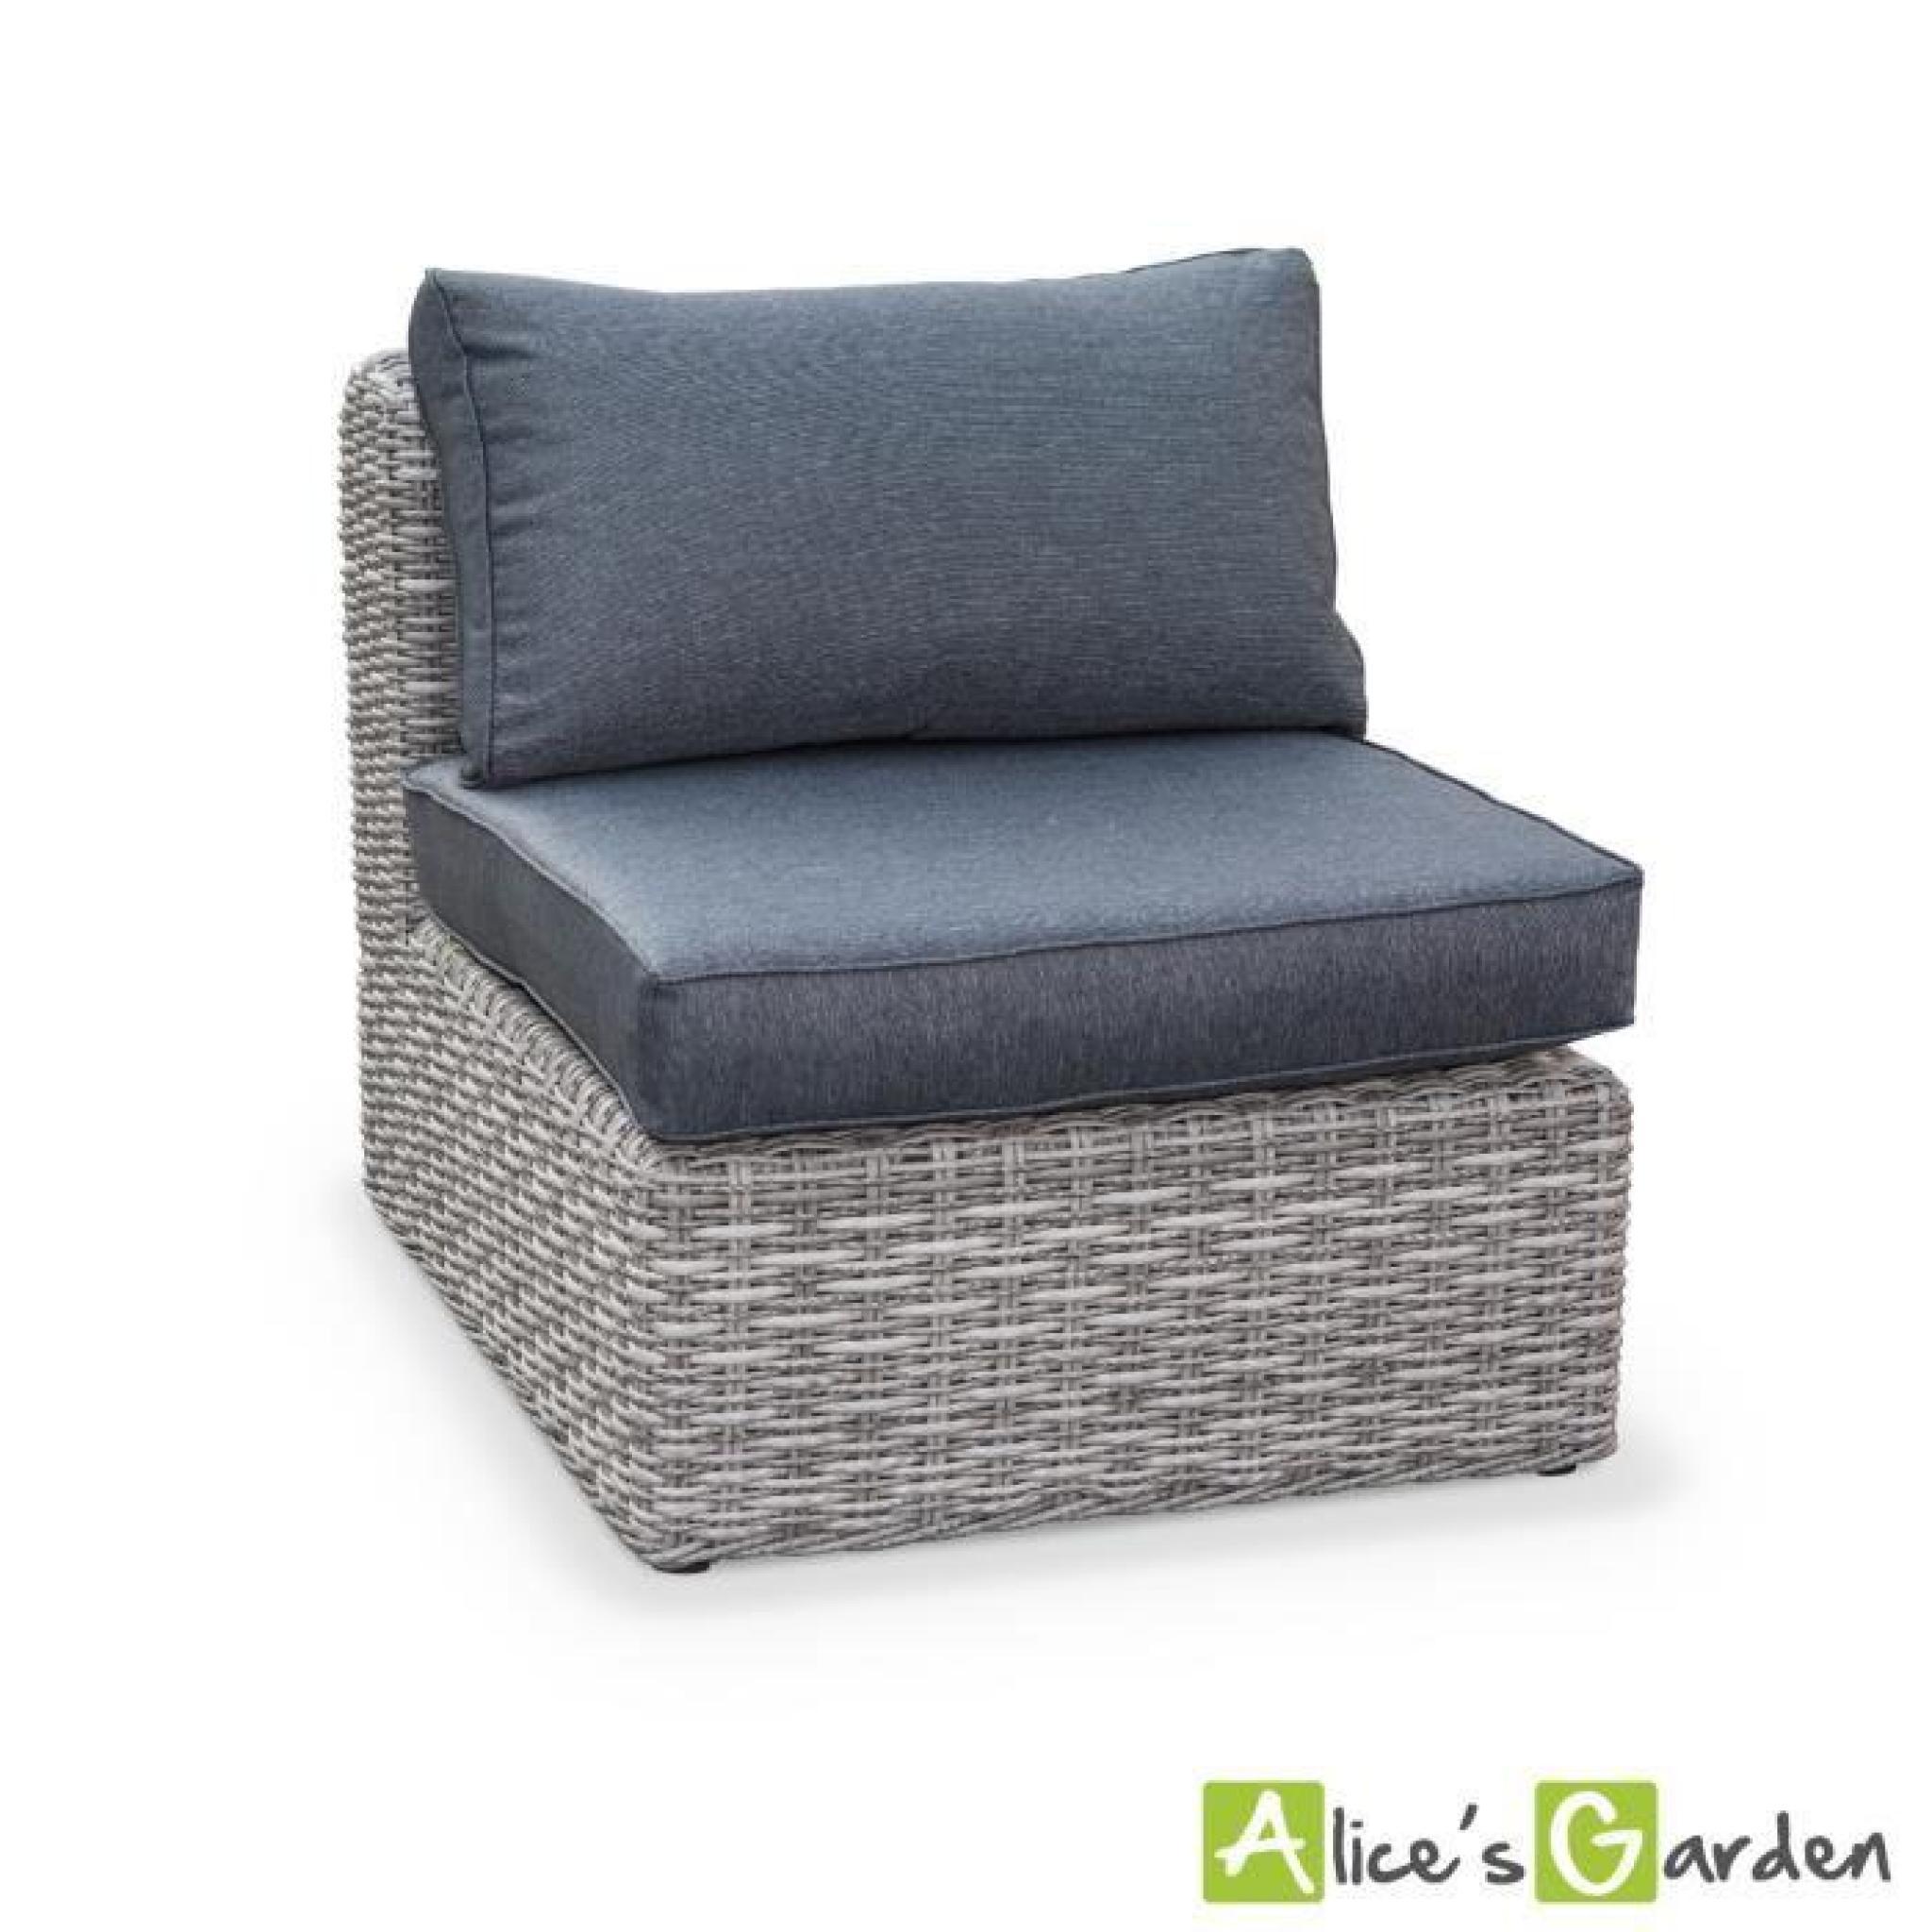 salon de jardin tonico en r sine tress e arrondie 3. Black Bedroom Furniture Sets. Home Design Ideas